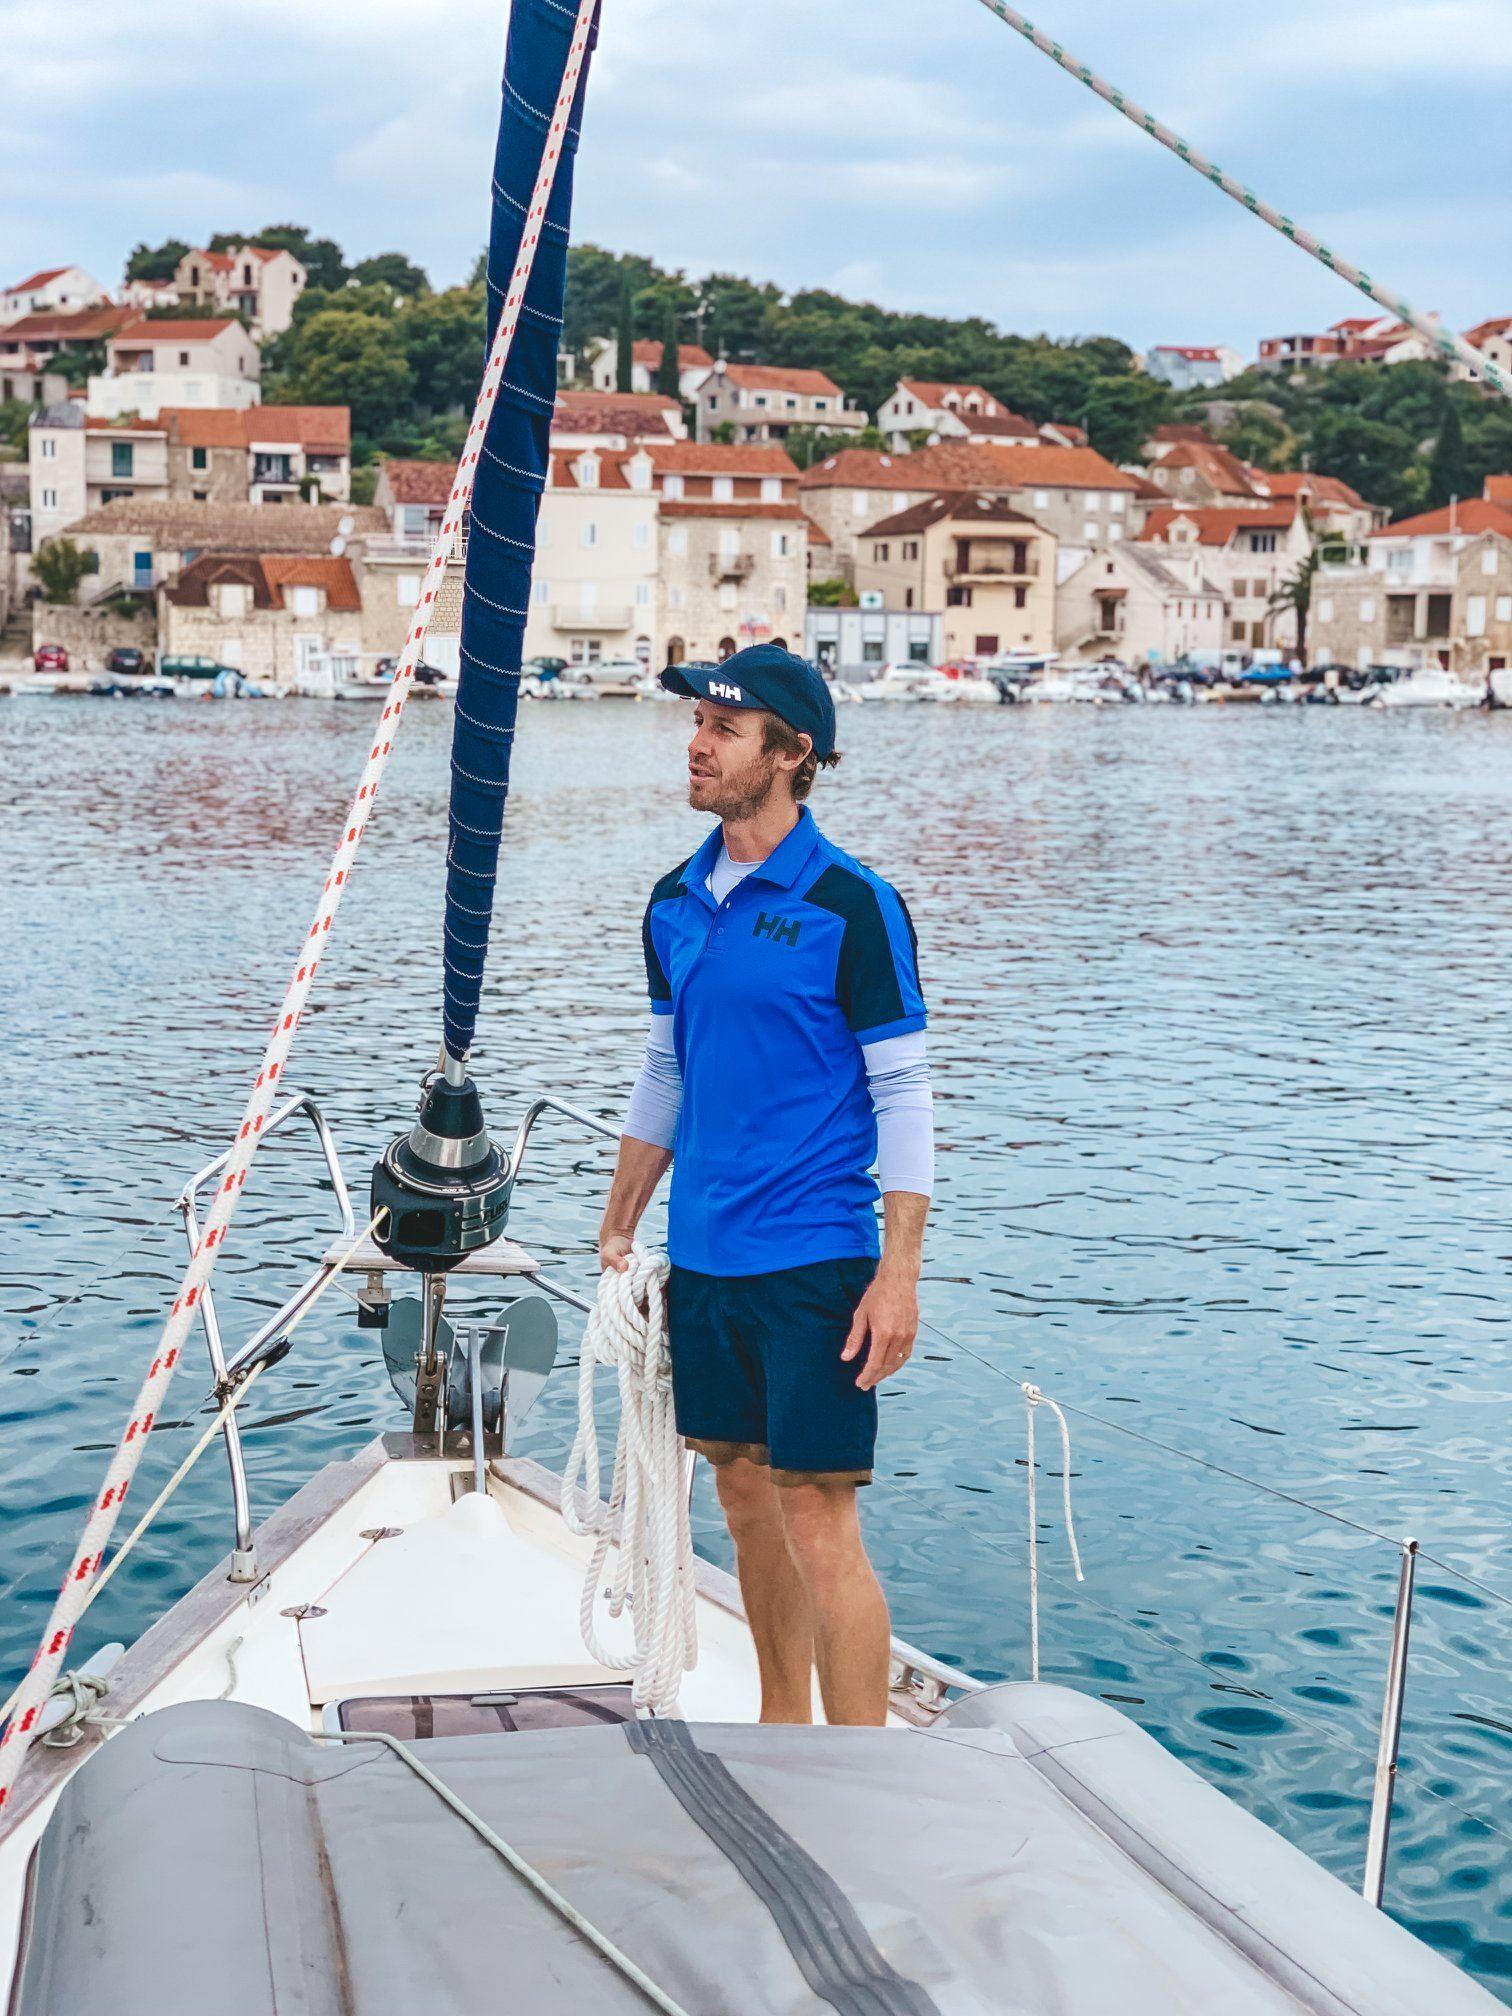 A Travel Guide To Island Brac, Croatia